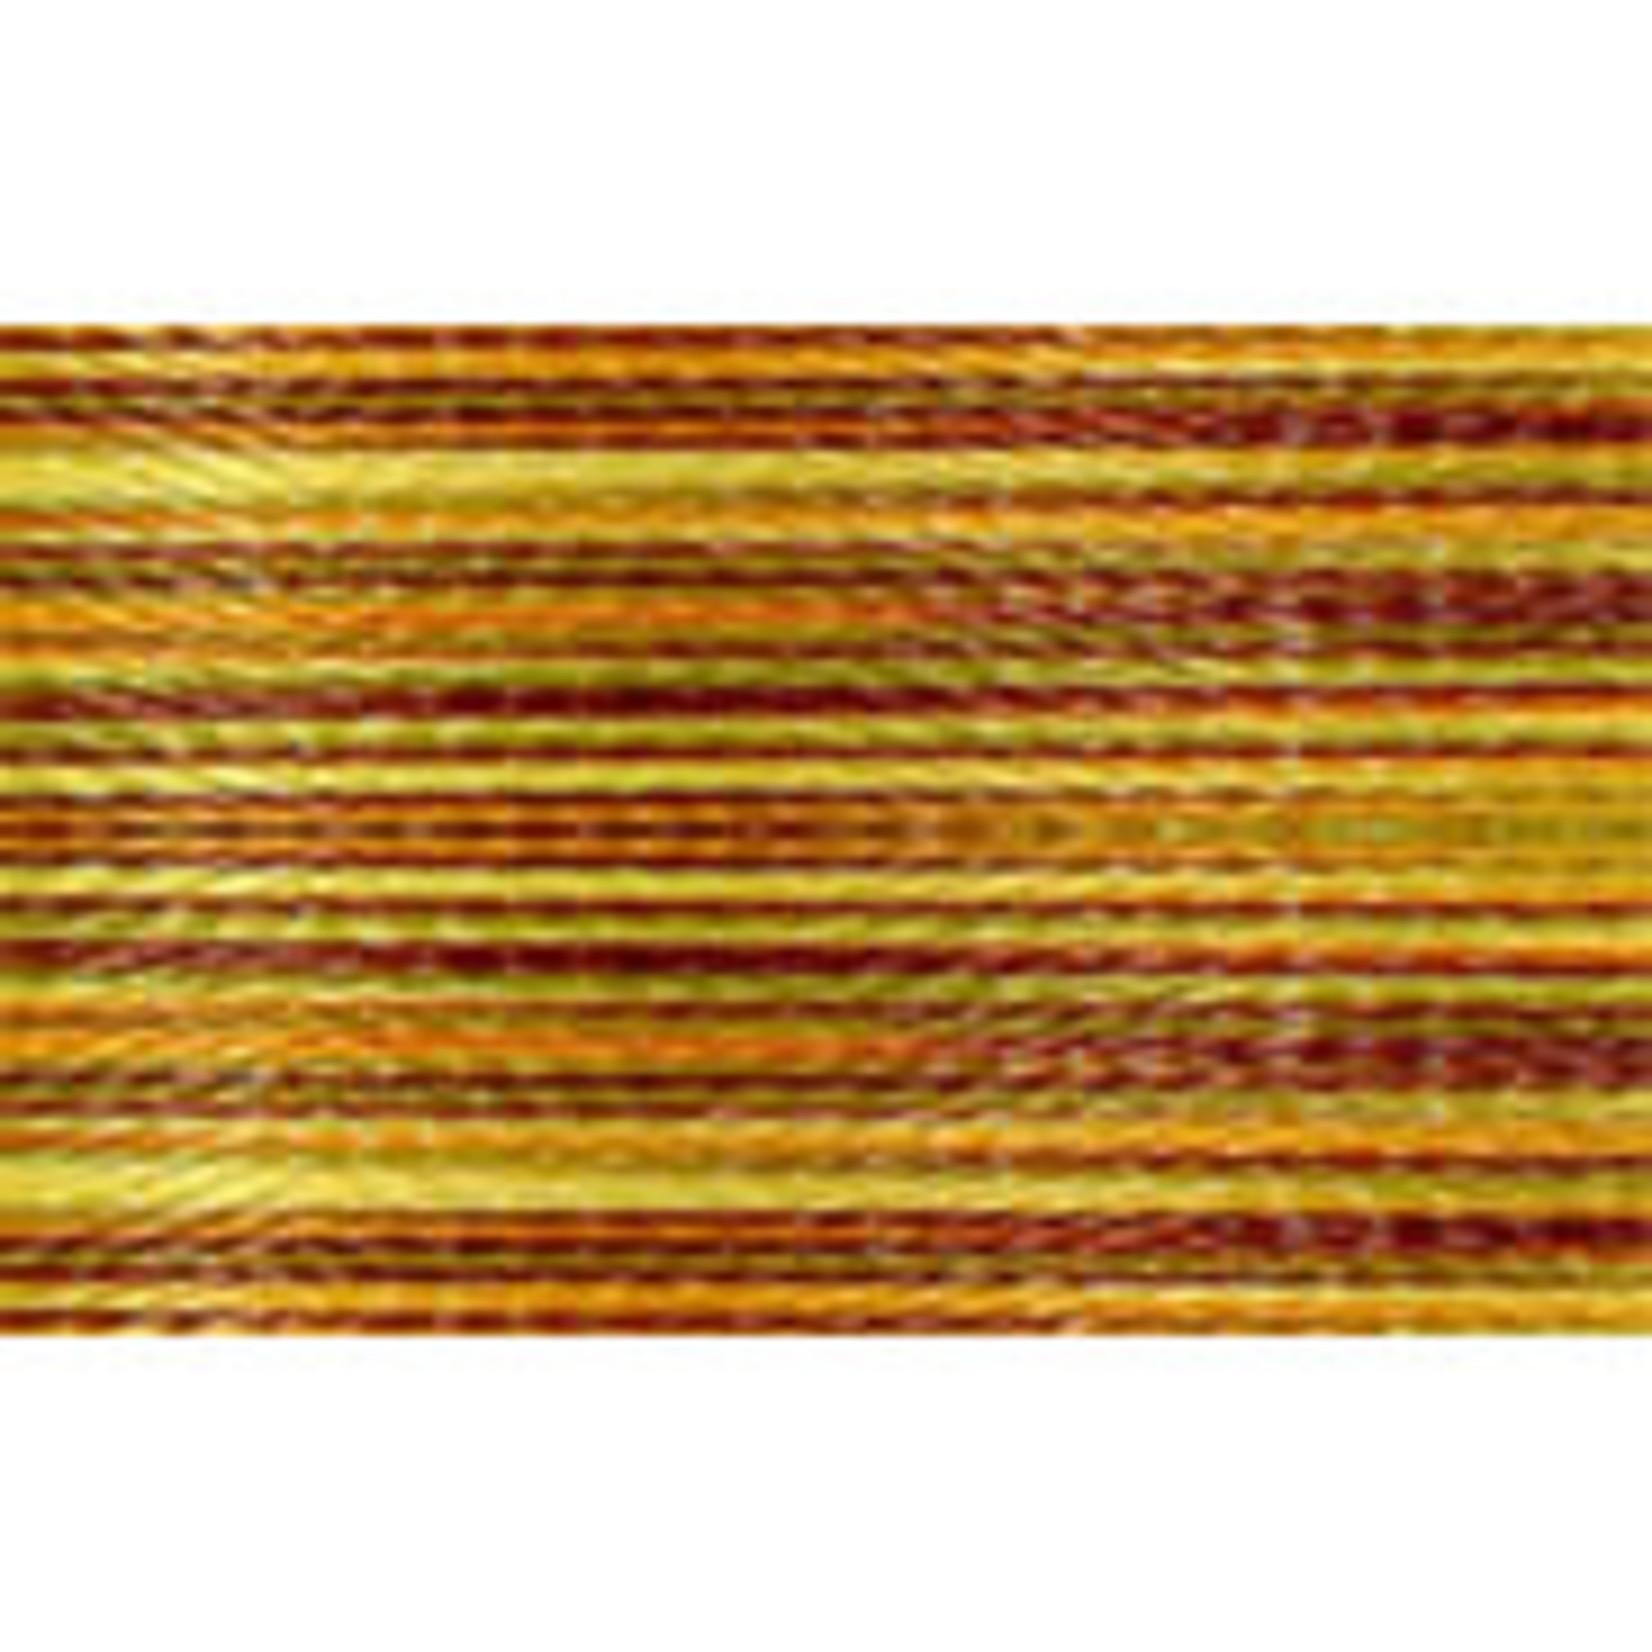 Amann Mettler Isacord Multi - #40 - 1000 m - 9975